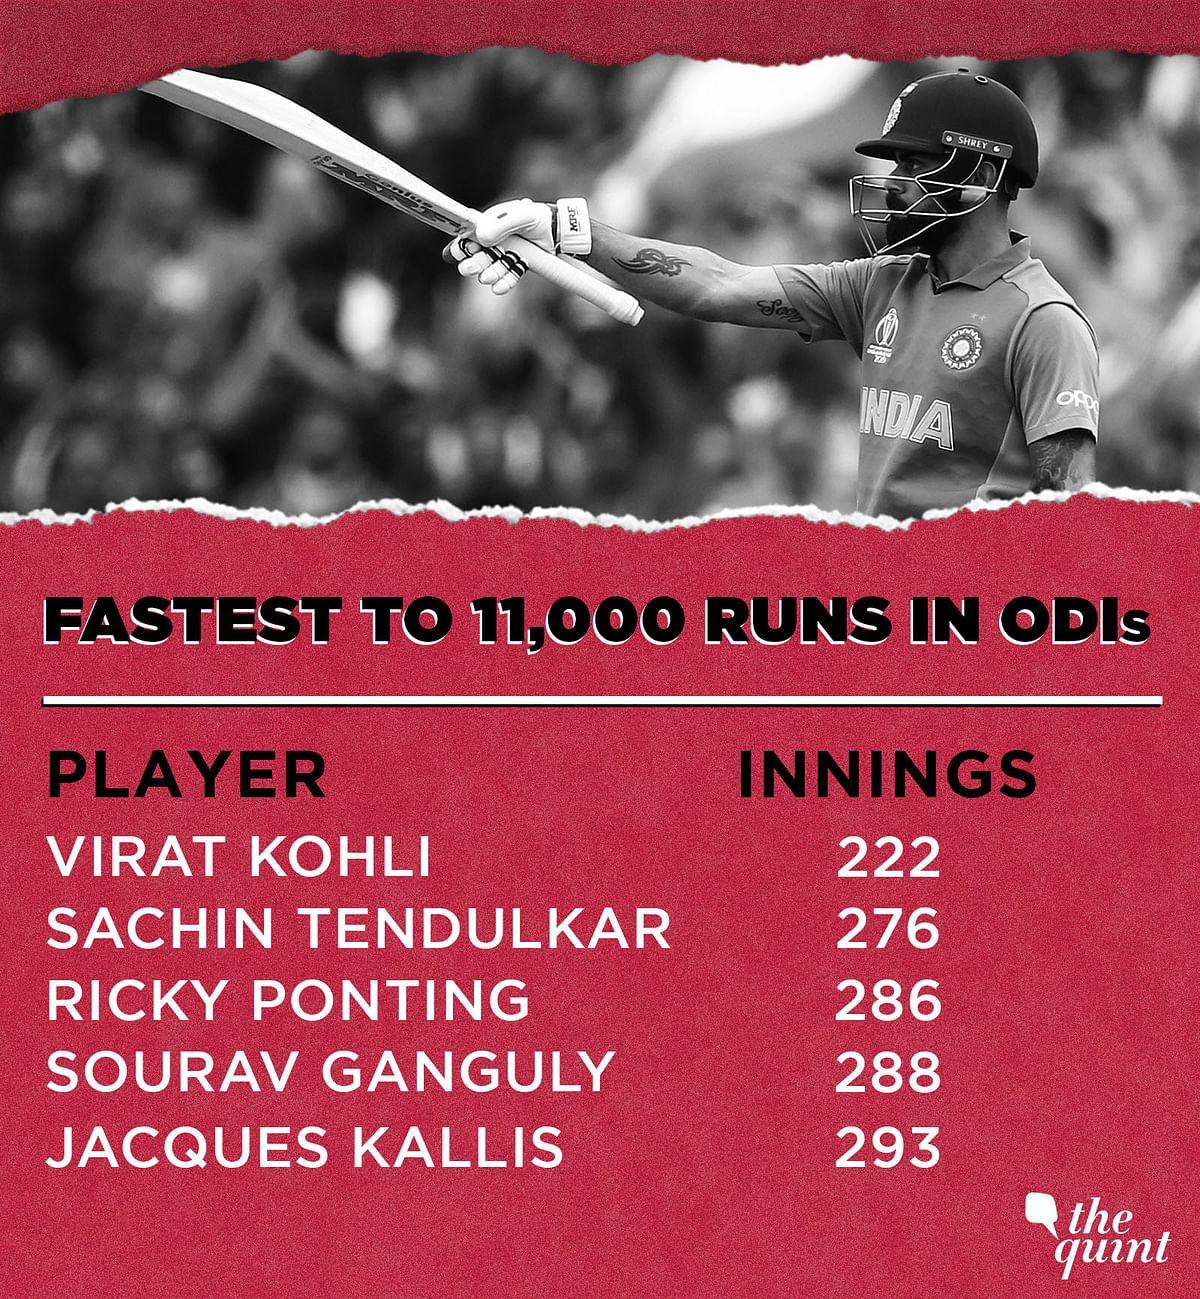 Virat Kohli Quickest to 11,000 ODI Runs, Surpasses Tendulkar